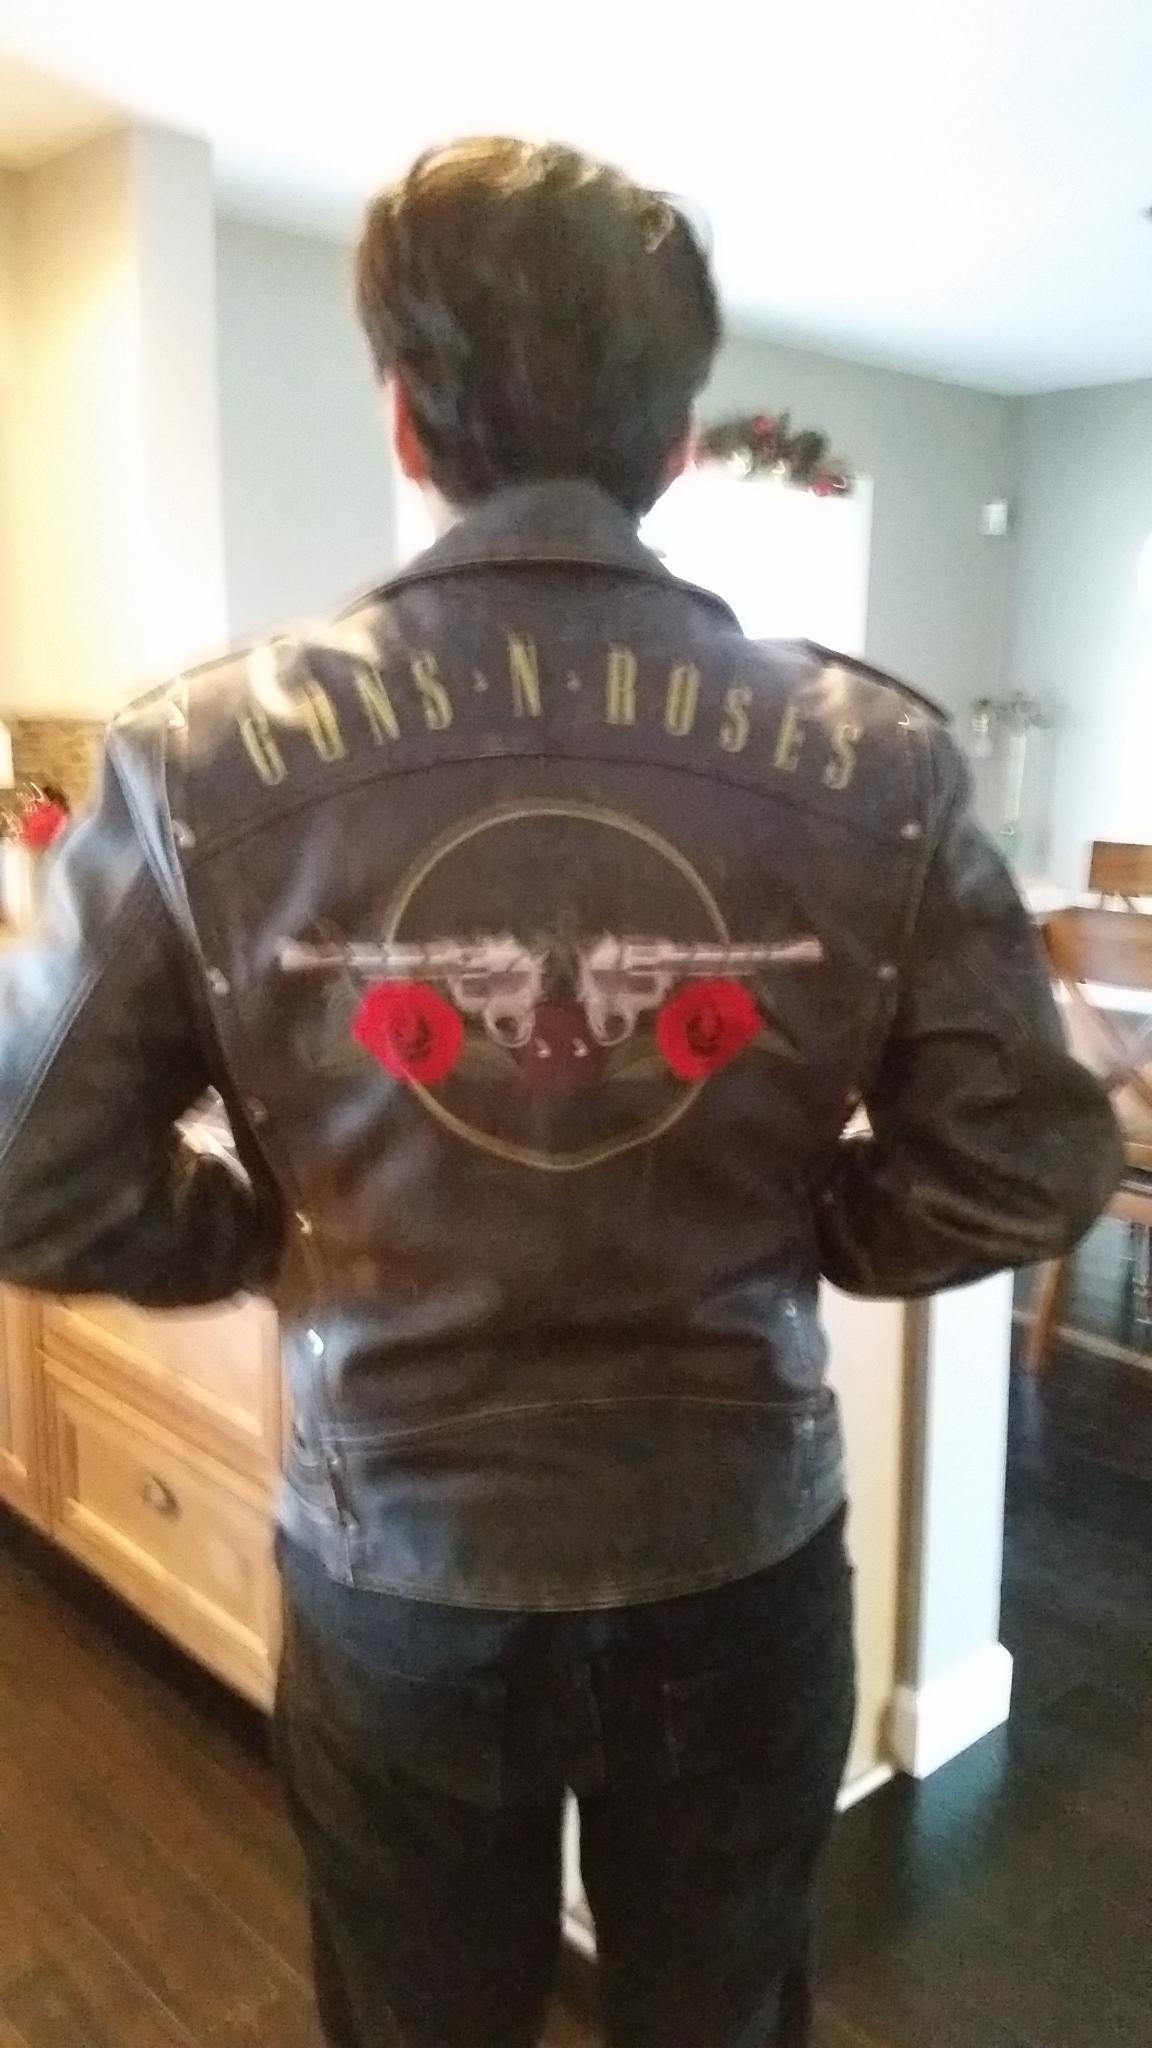 LEDERJACKE HEIN Gericke Speedware Guns N Roses Größe M